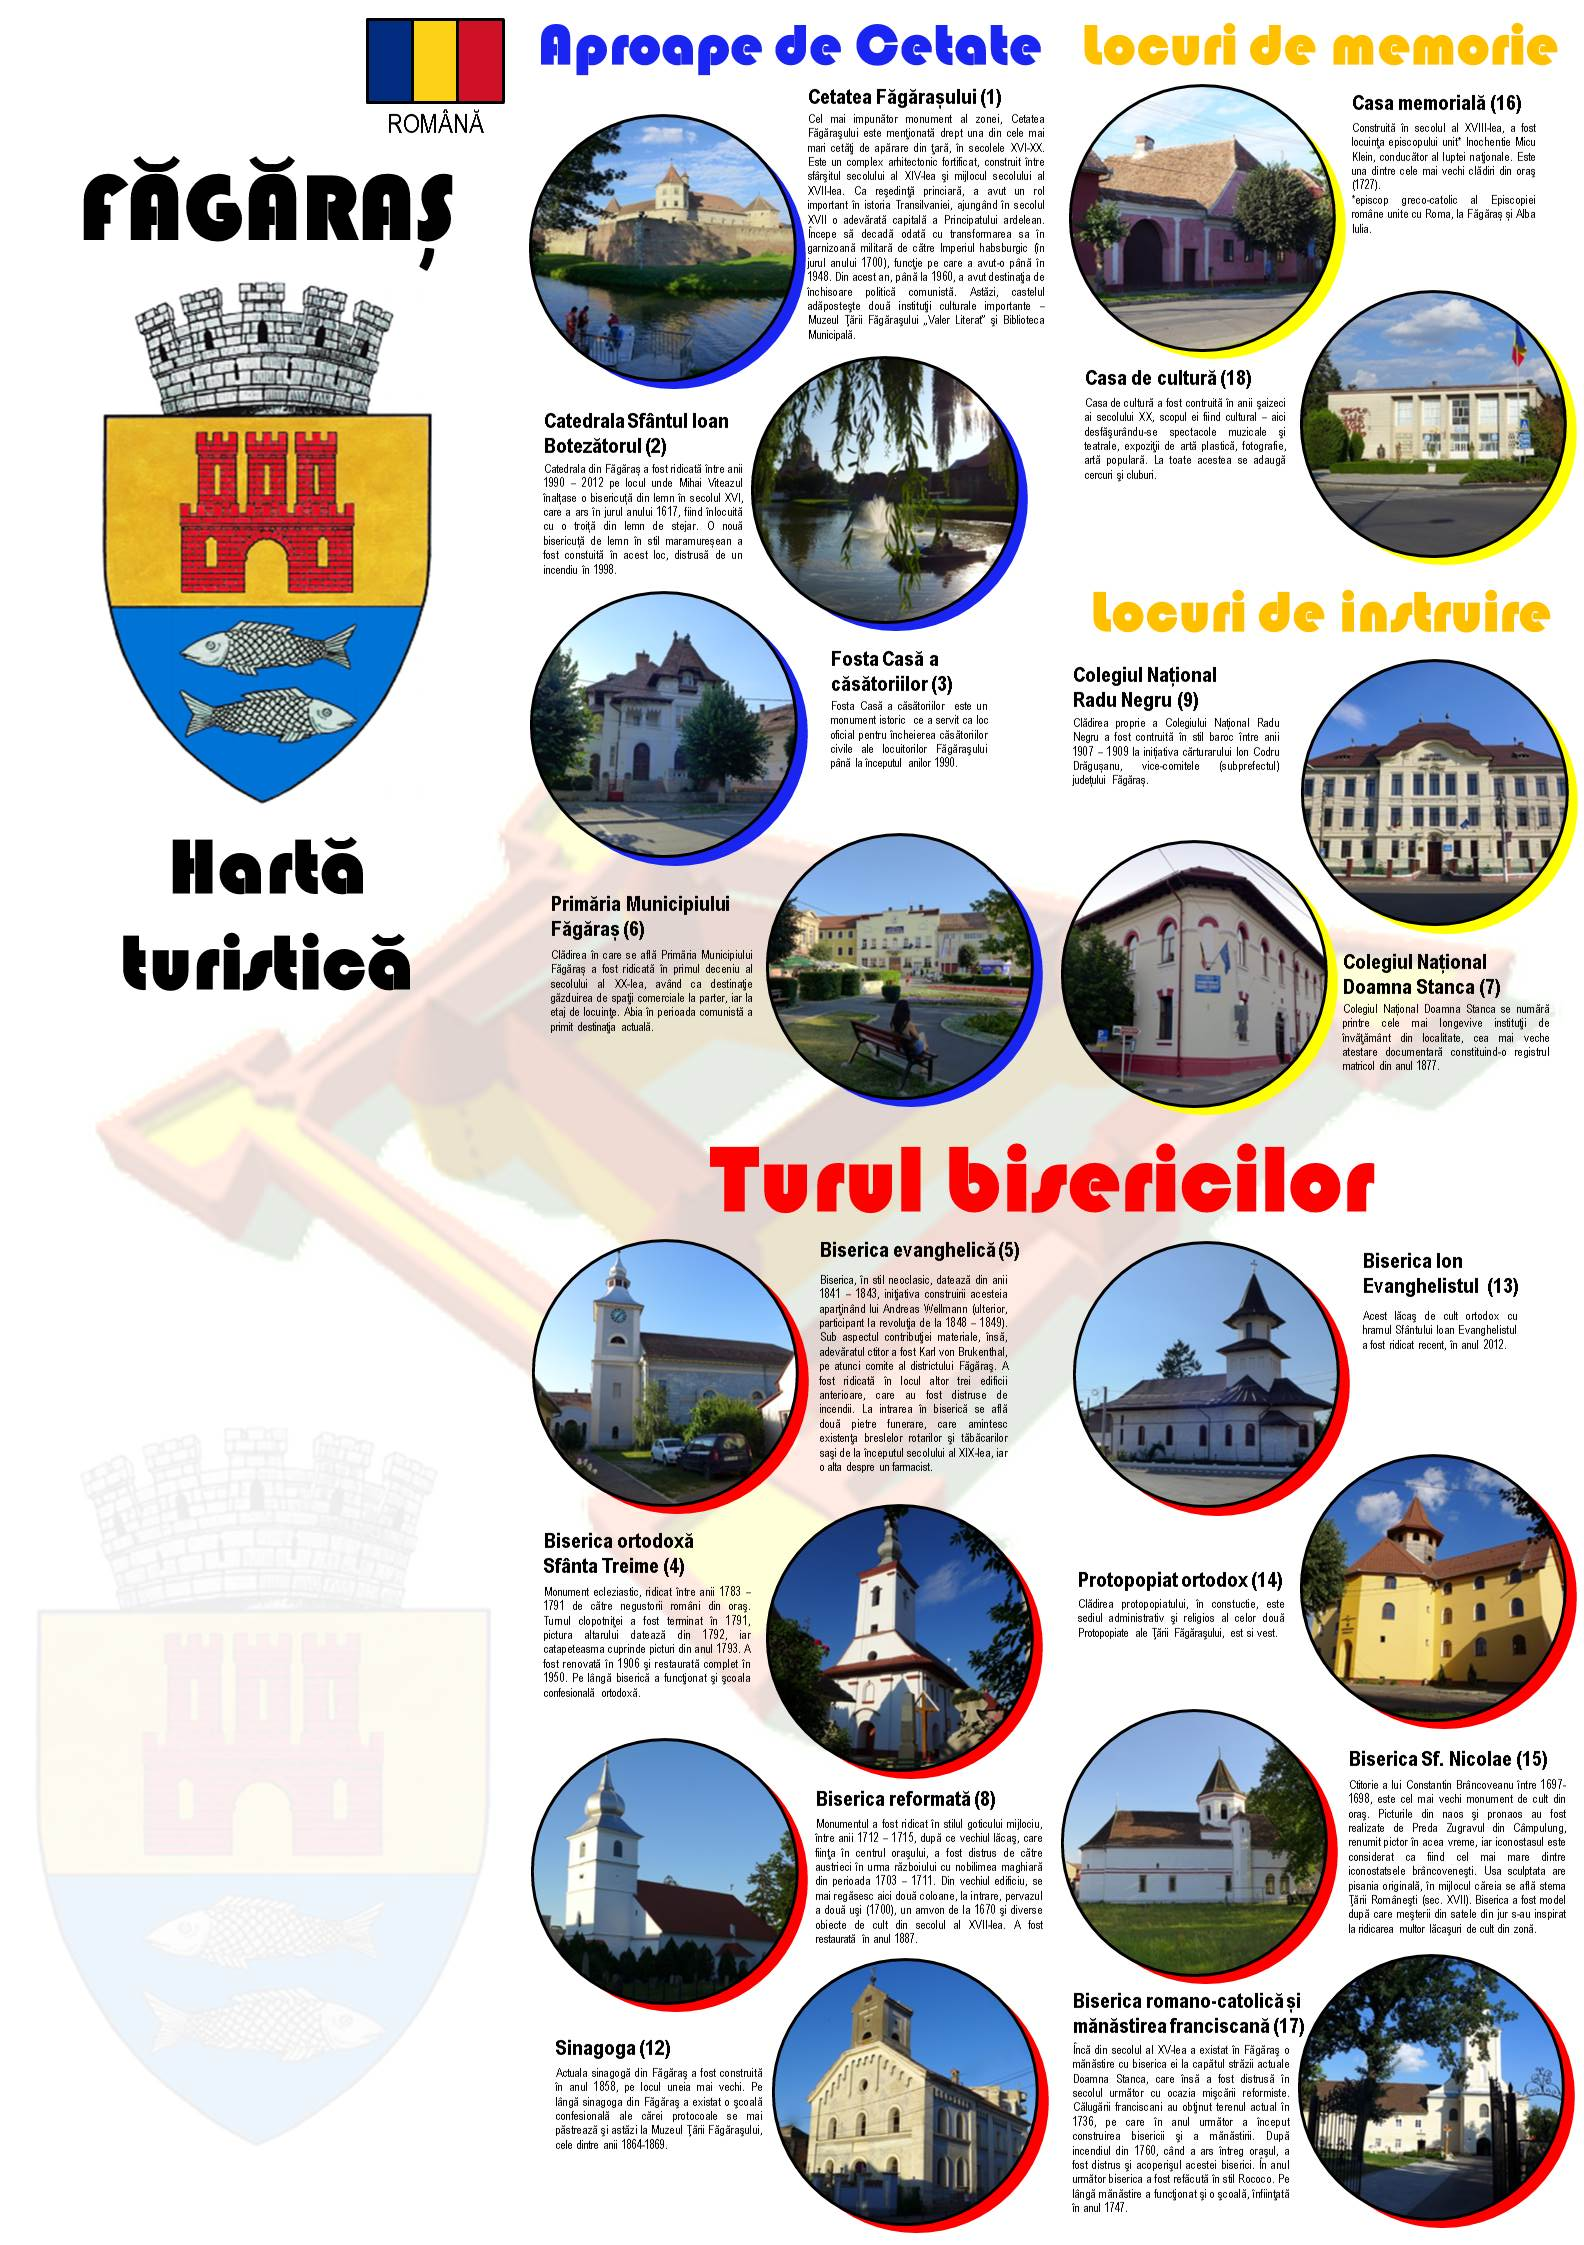 File Harta Turistica Fagaras Legenda Jpg Wikimedia Commons